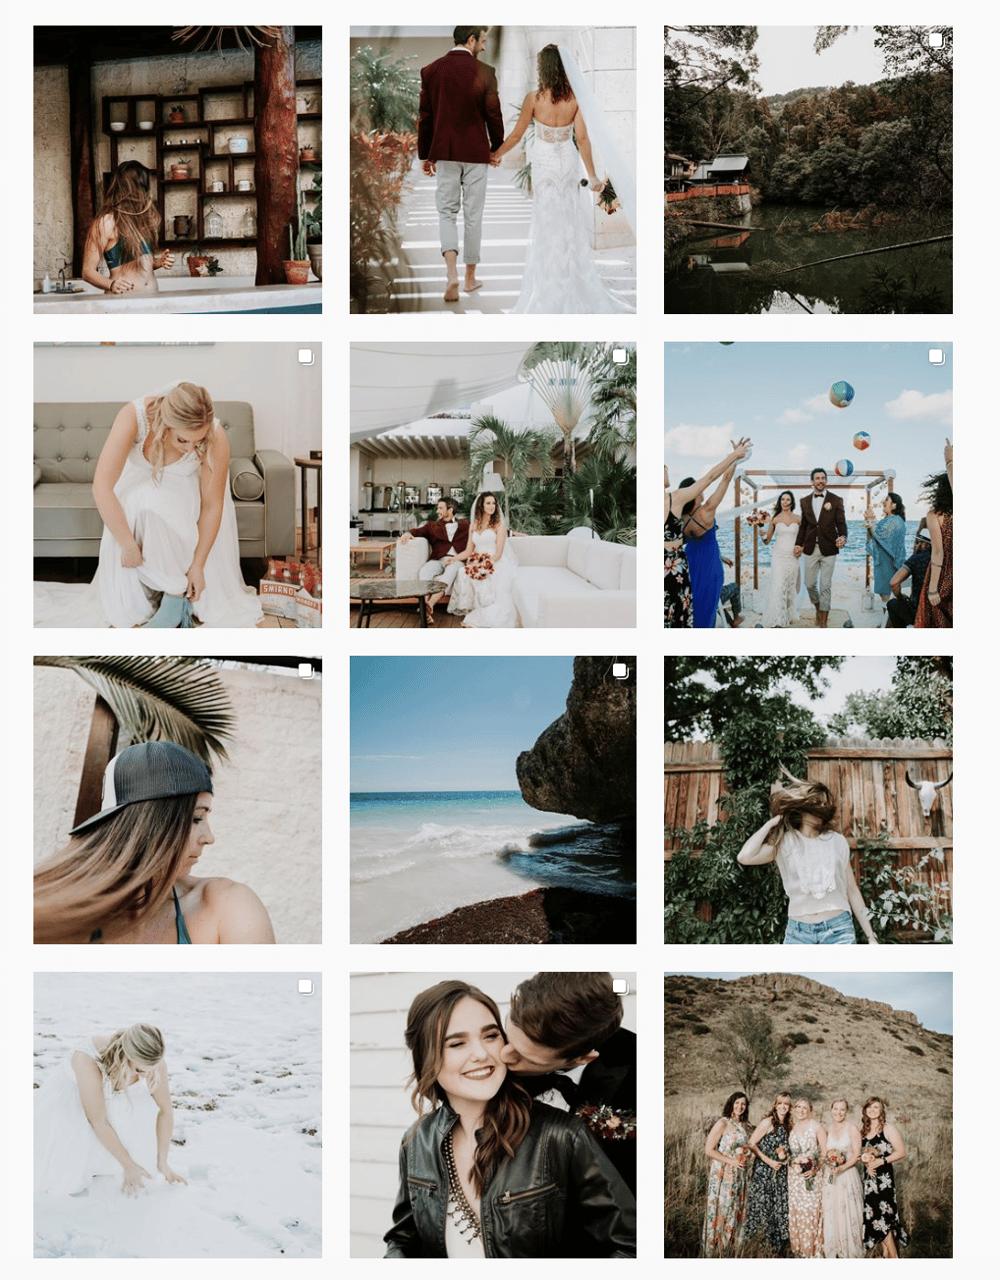 Colorado Wedding + Travel Photographer - image 4 - student project